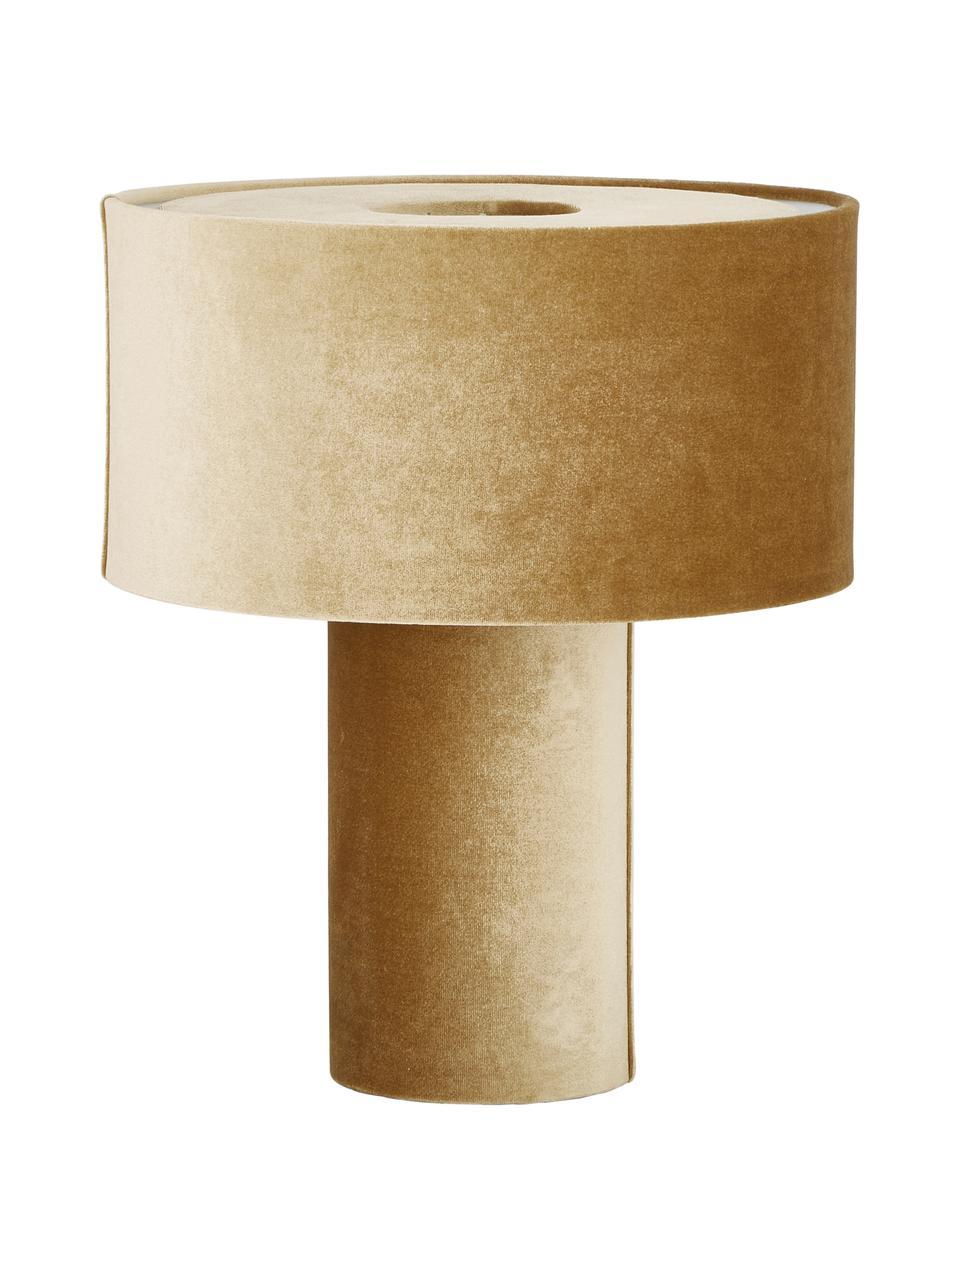 Samt-Tischlampe Frida in Senfgelb, Lampenfuß: Kunststoff mit Samtbezug, Lampenschirm: Samt, Senfgelb, Ø 30 x H 36 cm